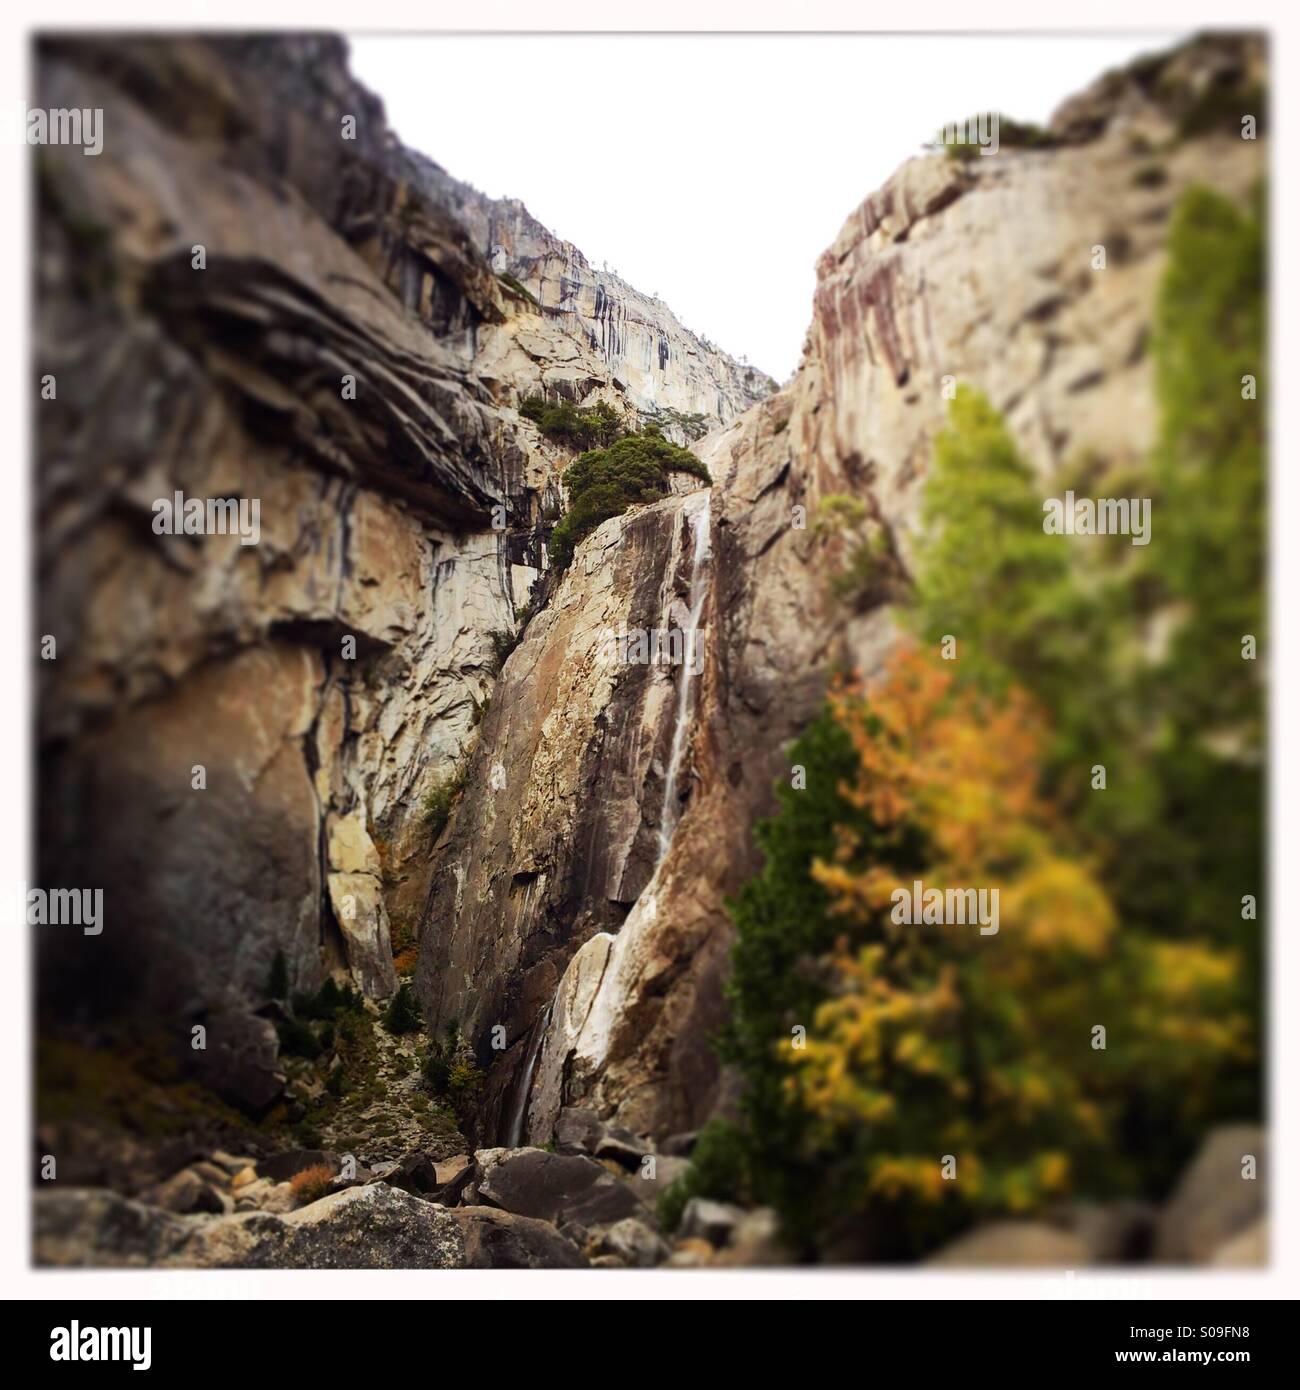 Lower Yosemite Falls at a trickle during fall. Yosemite Valley, Yosemite National Park, Mariposa County, California, - Stock Image